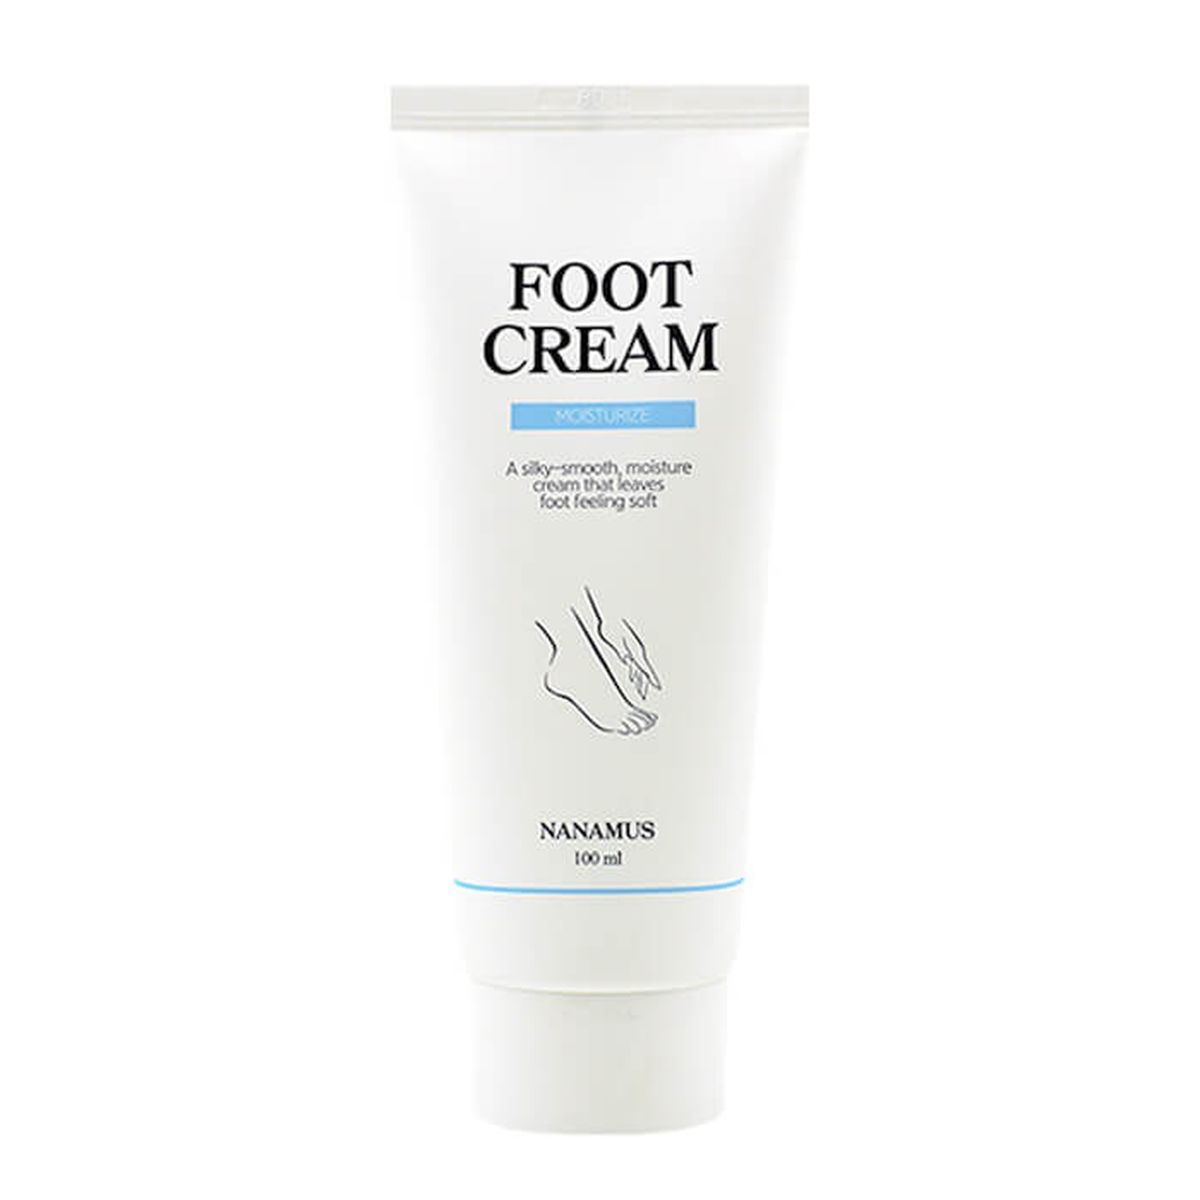 Увлажняющий крем для ног NANAMUS Foot Cream